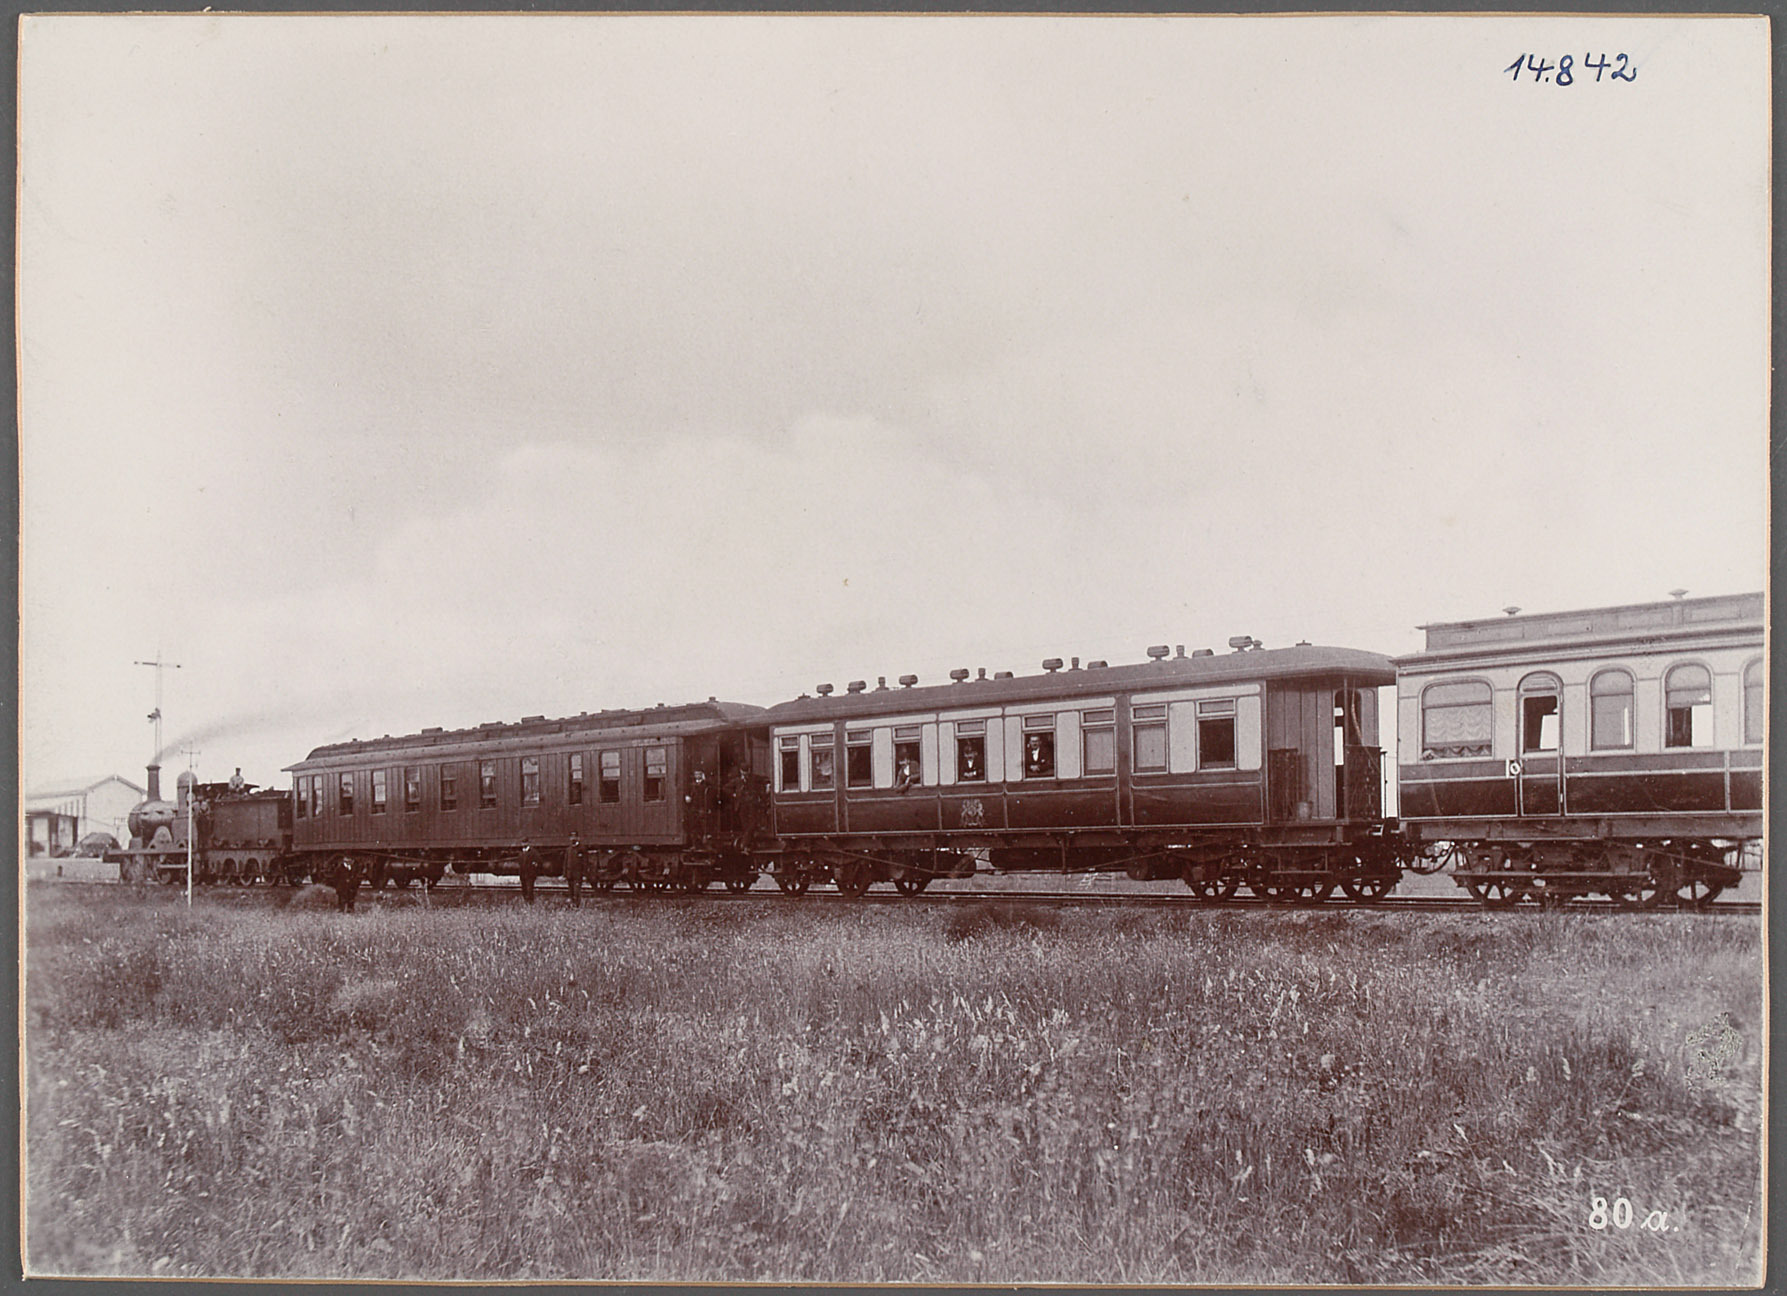 Australien, Naramine. 18.5.1893. Eisenbahnzug [Narromine] von Eduard Hodek jun.